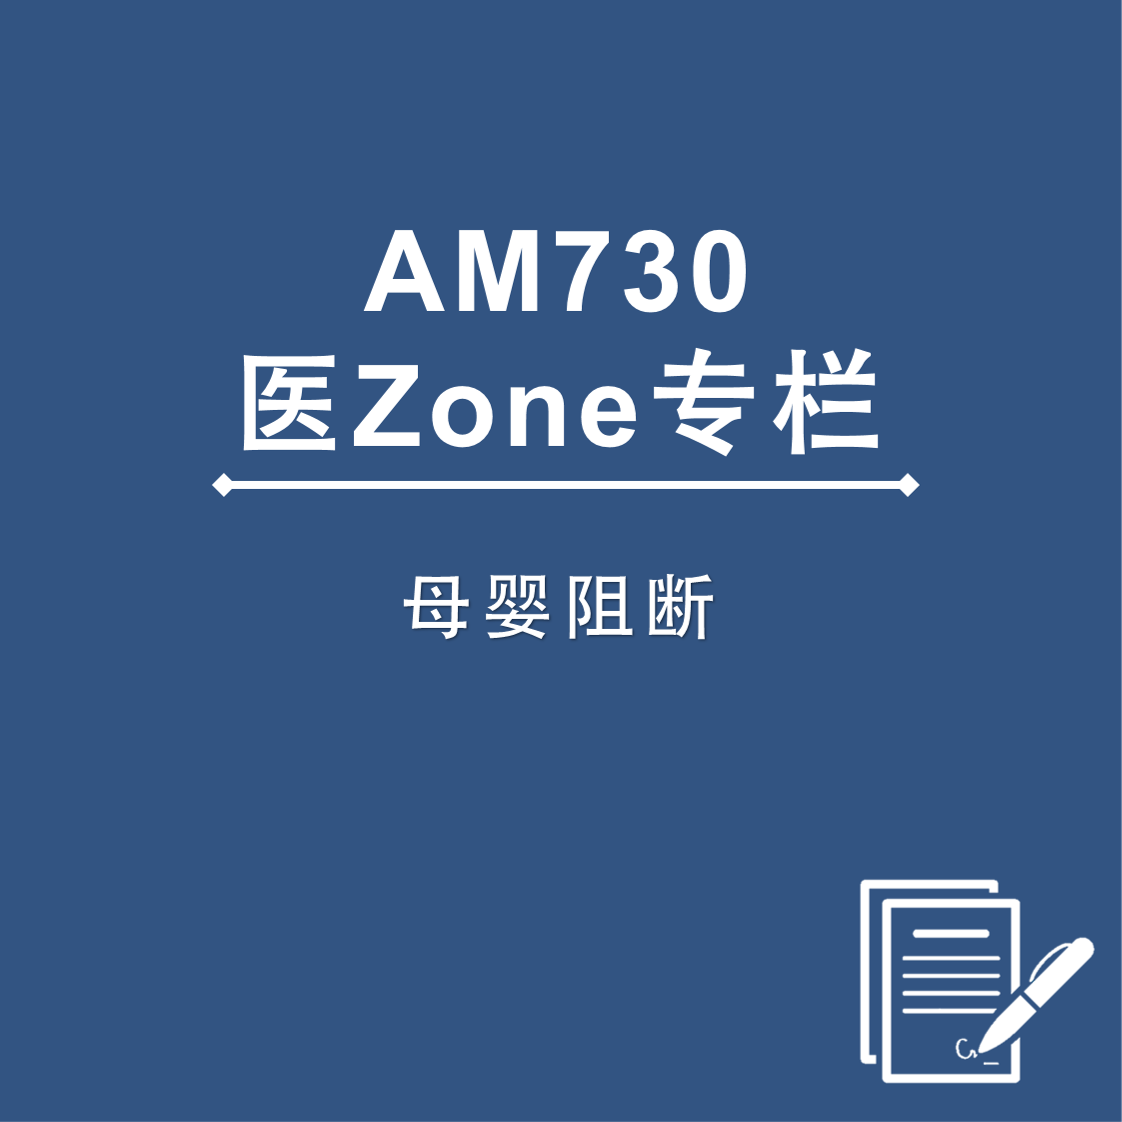 AM730 医Zone 专栏 - 母婴阻断